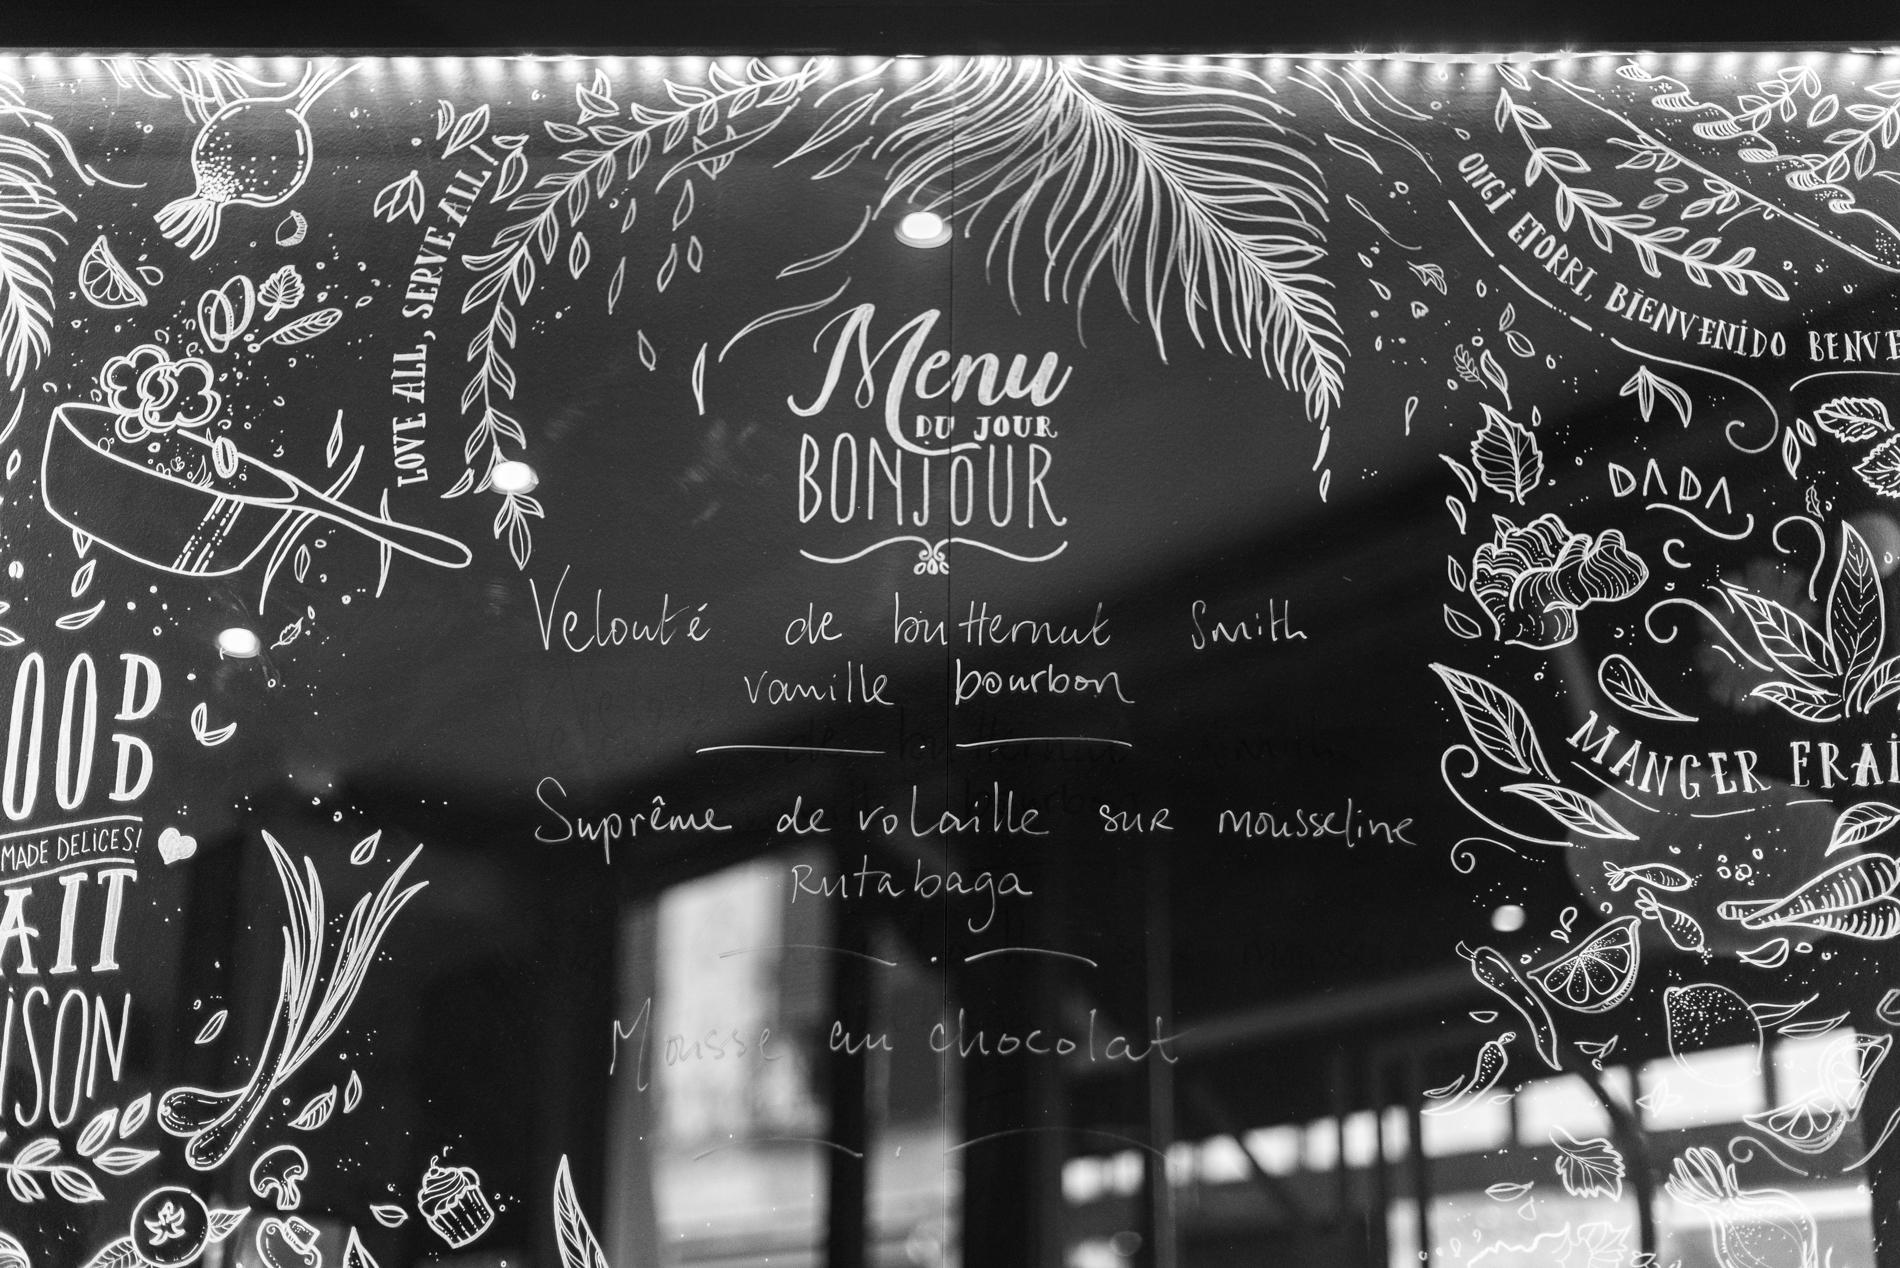 Fresque lettring d'Anna Petrissans auRestaurant Kitchen Dada à Bayonne